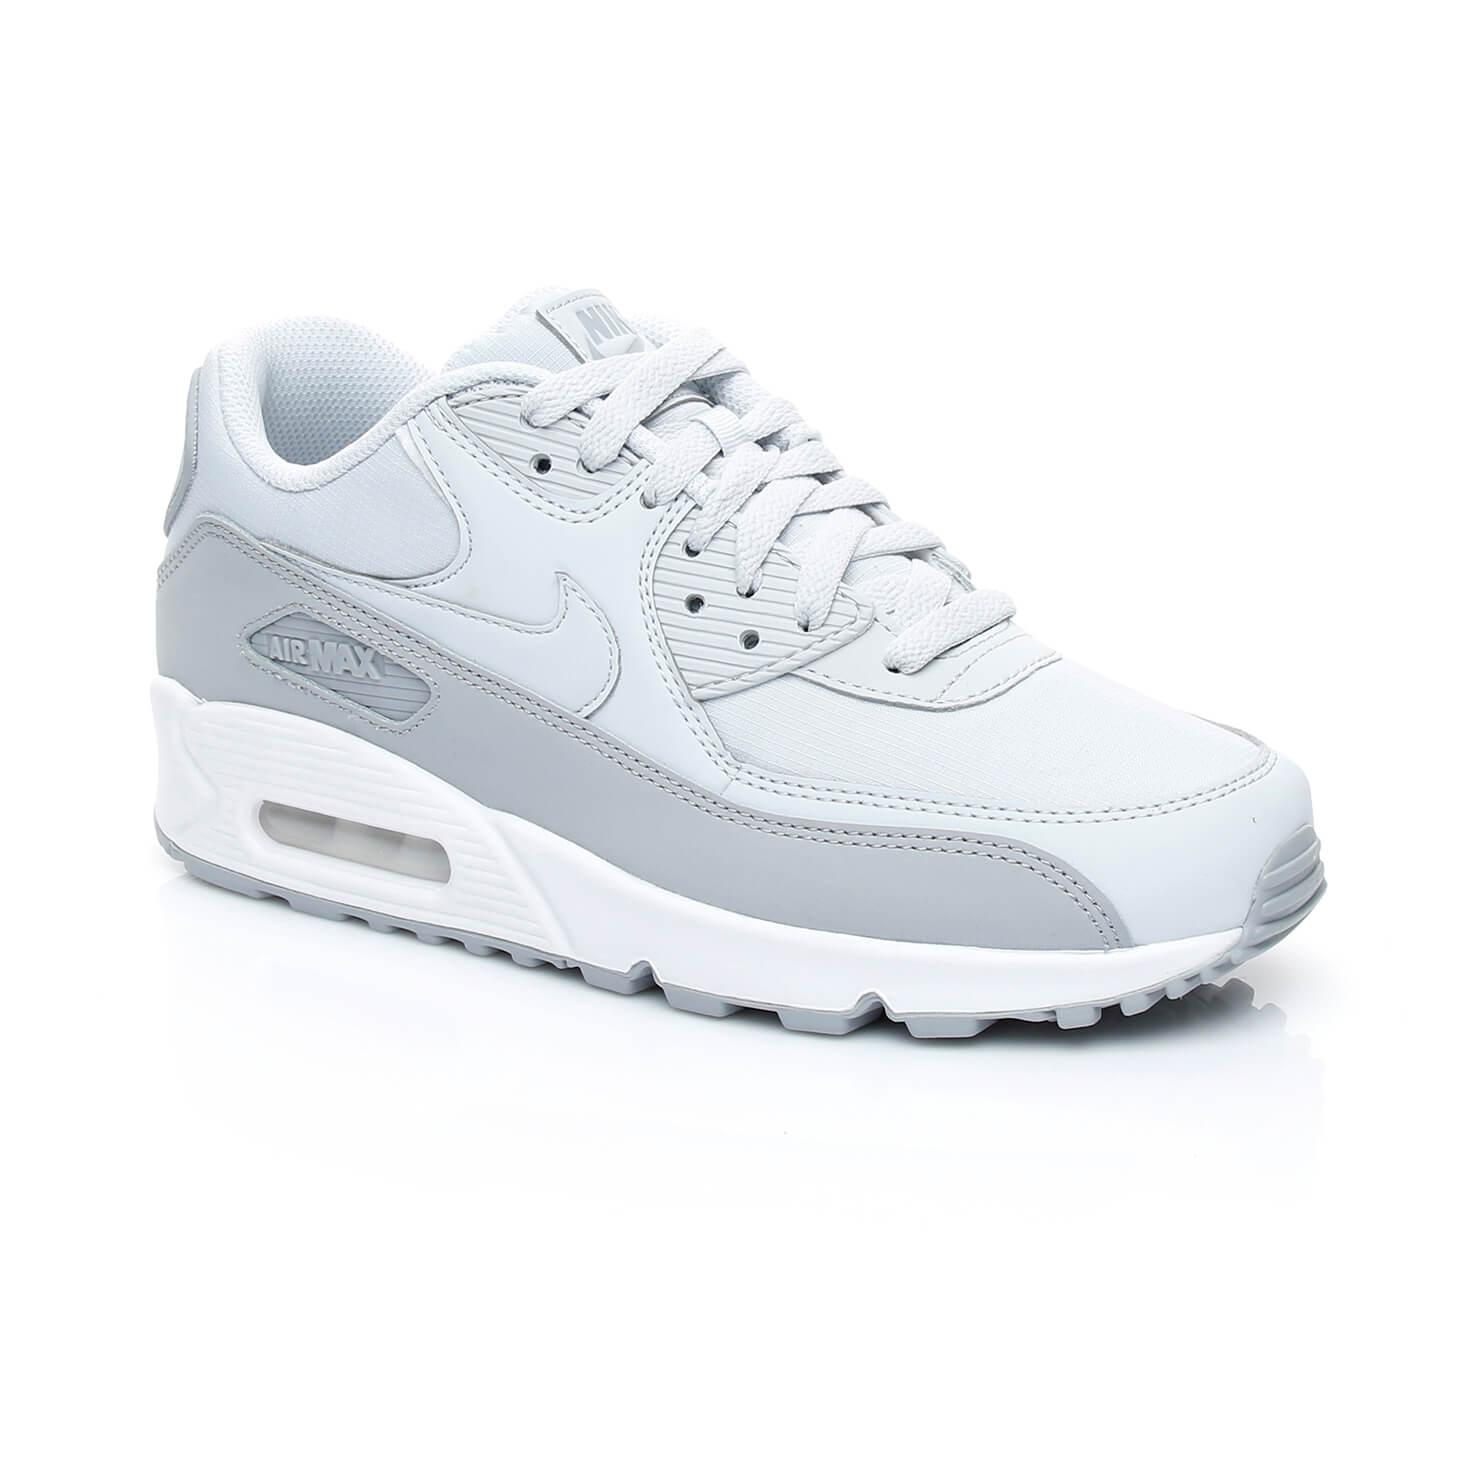 38de3df19235be Nike Air Max 90 Essential Erkek Beyaz Sneaker Erkek Spor Ayakkabı ...